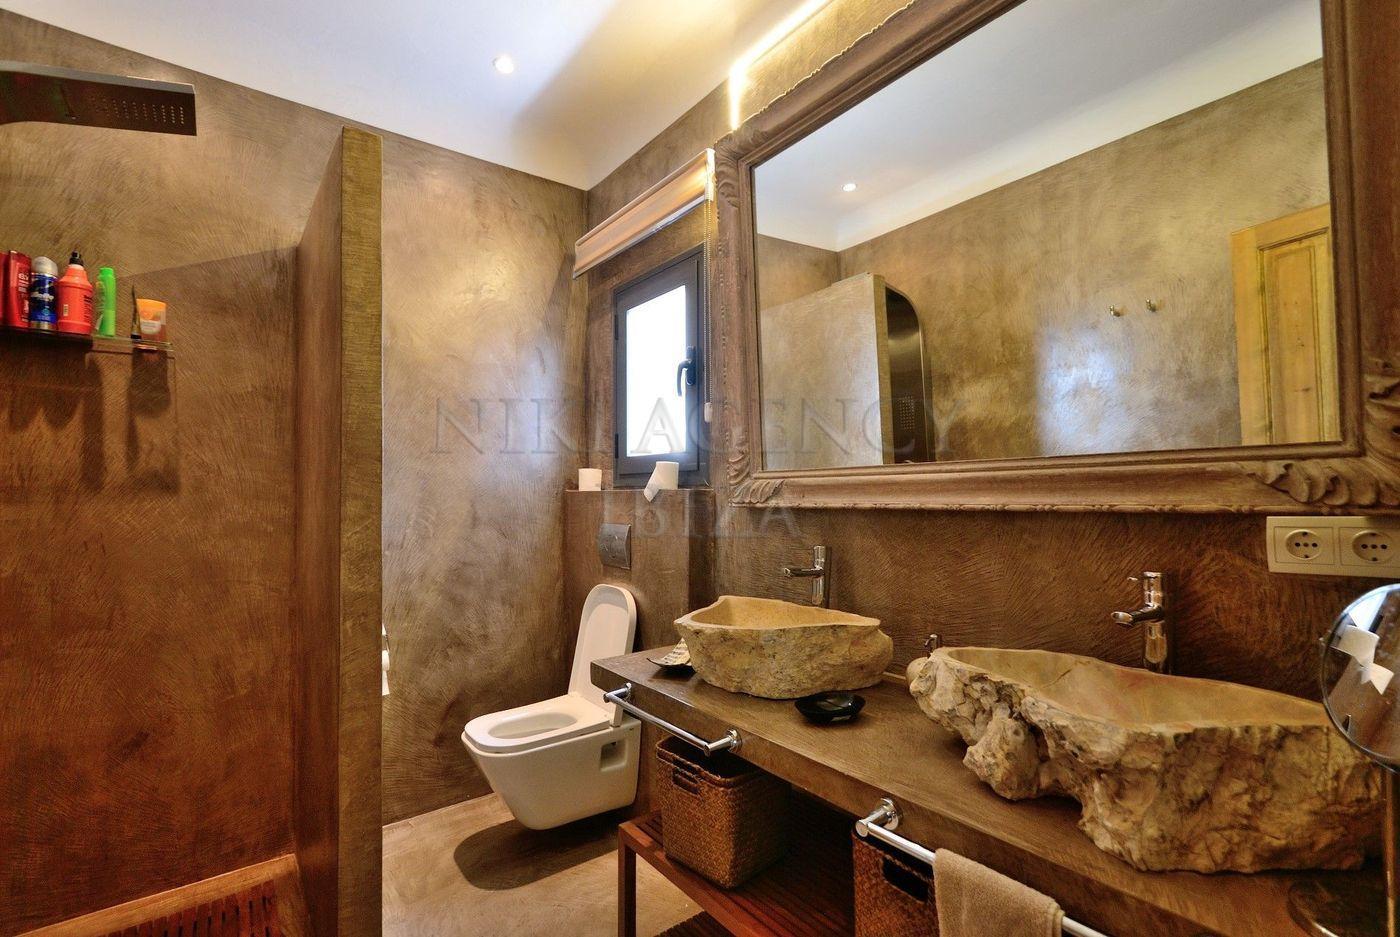 18. House for sale in Sant Josep de sa Talaia Ibiza - Fantastic 4 Bed Villa For Sale in Sant Josep de sa Talaia, Ibiza!